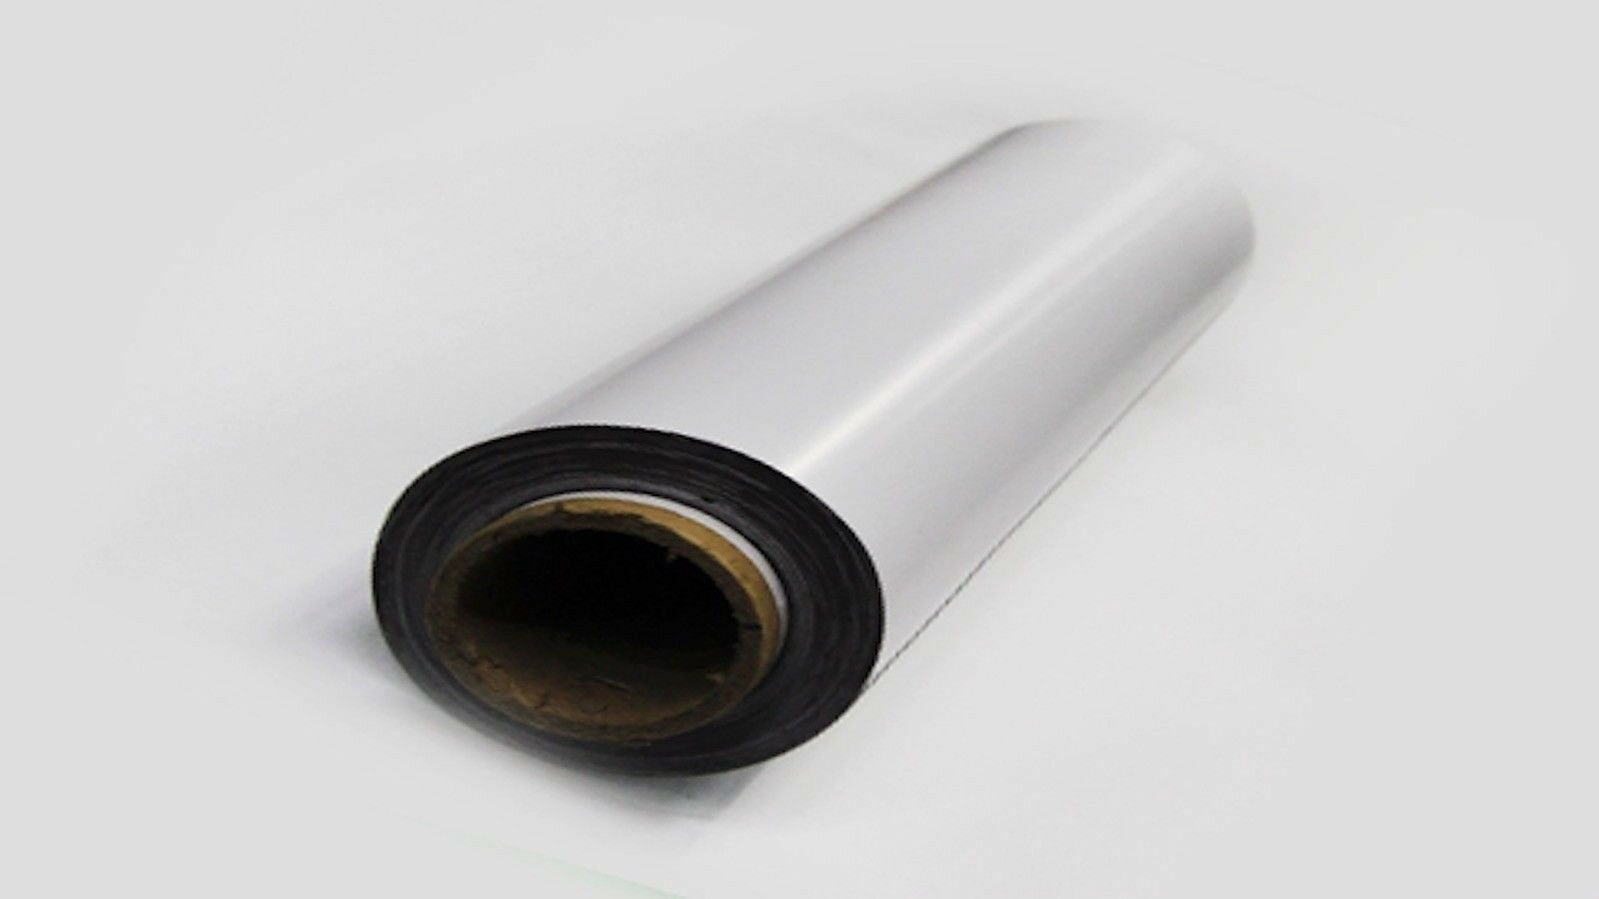 Magnetfolie 5 0 Meter matt Weiß beschichtet 0 5 85 mm x 40 cm x 500 cm Meterware be7b70